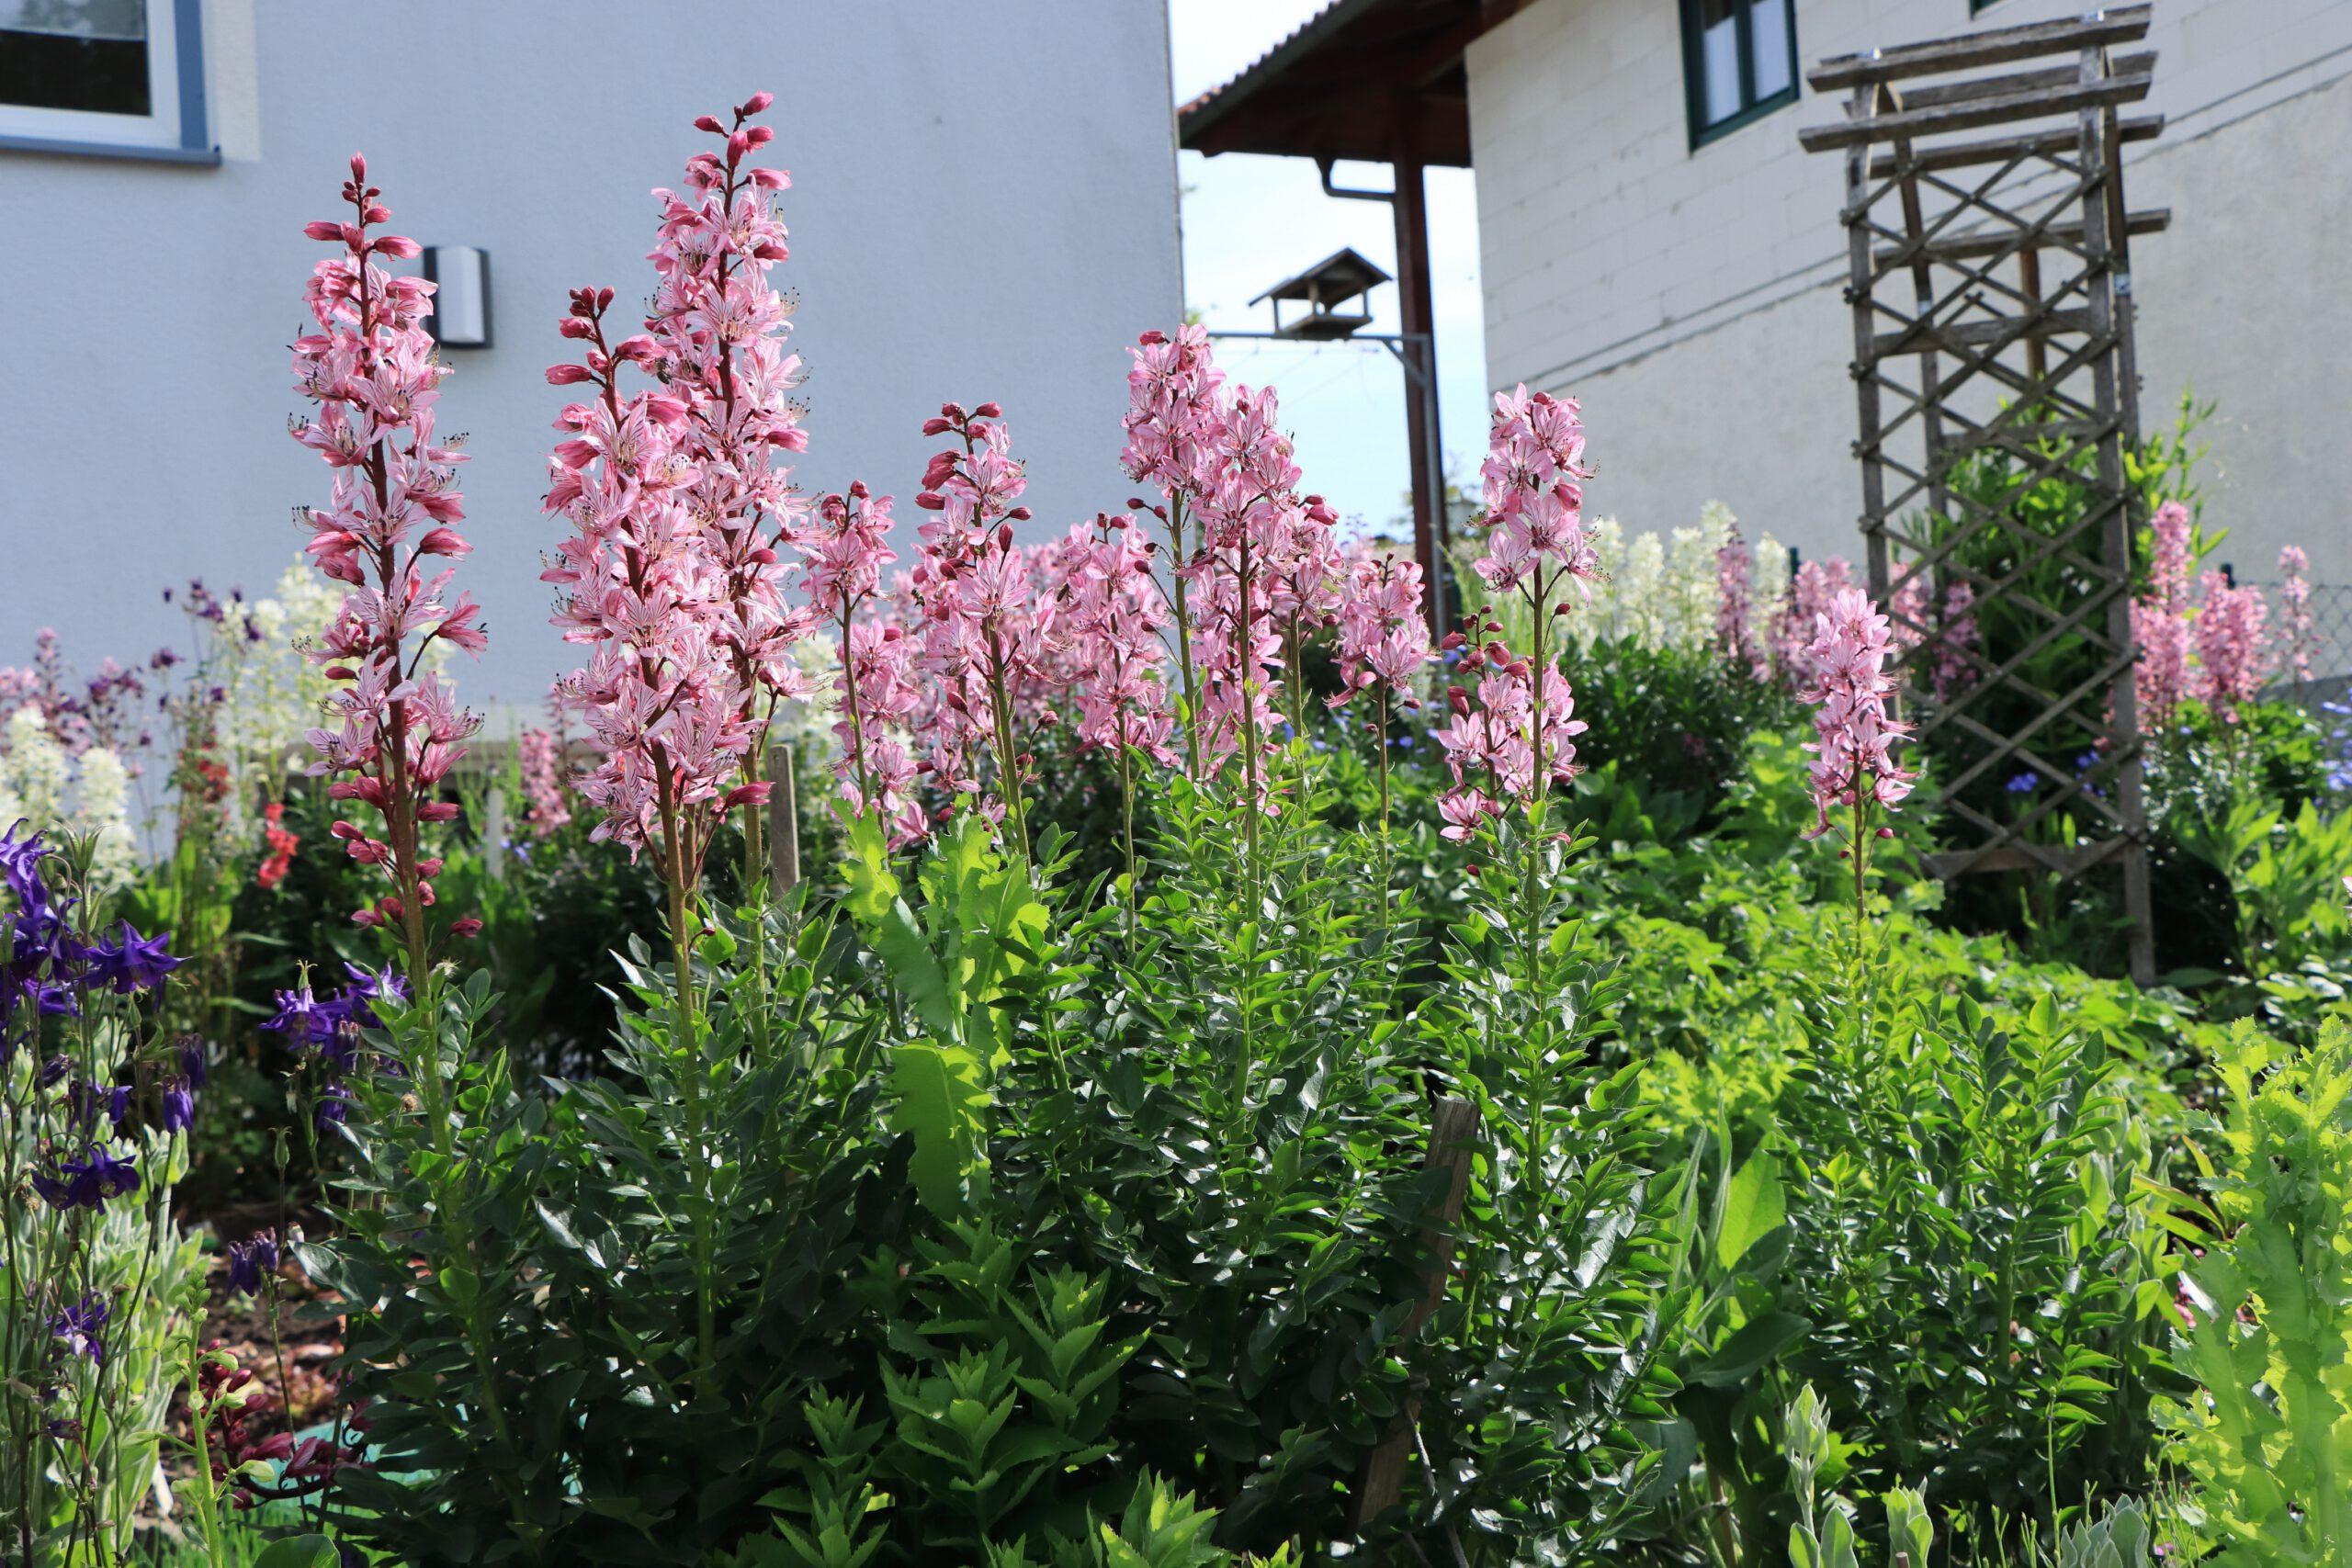 Diptam - Gesamte Pflanze